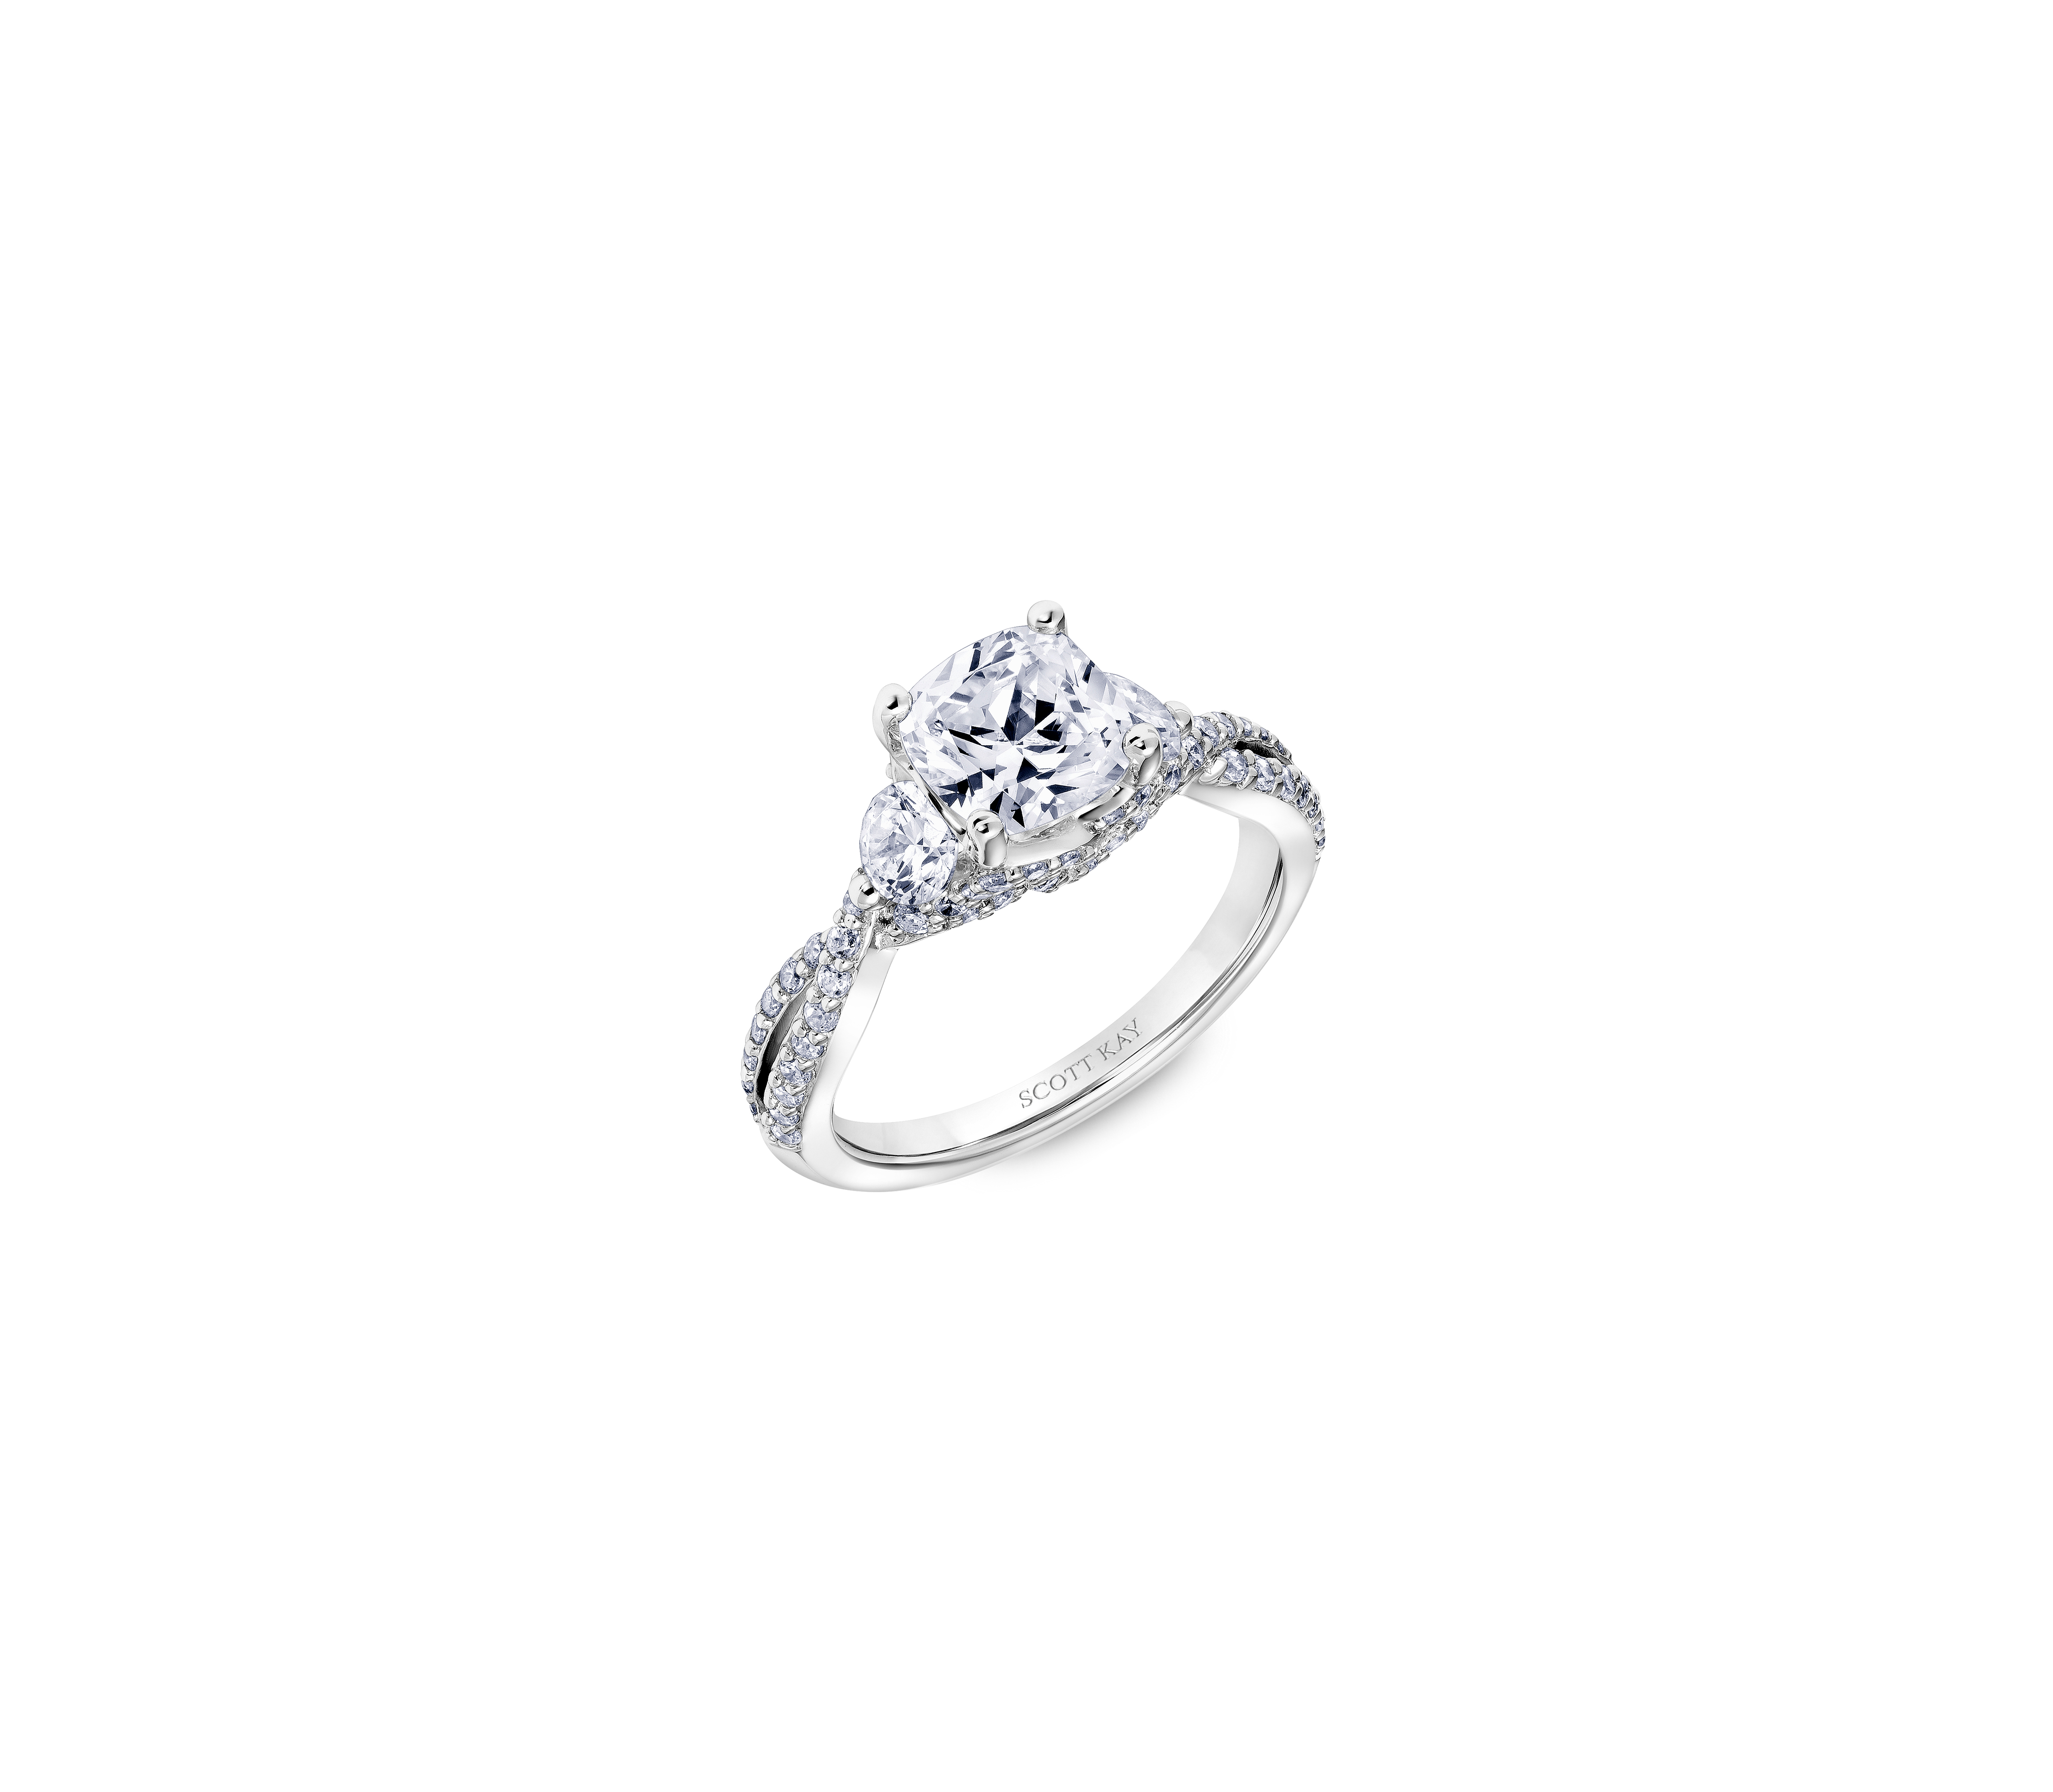 scott kay cushion cut engagement ring twisted pave band